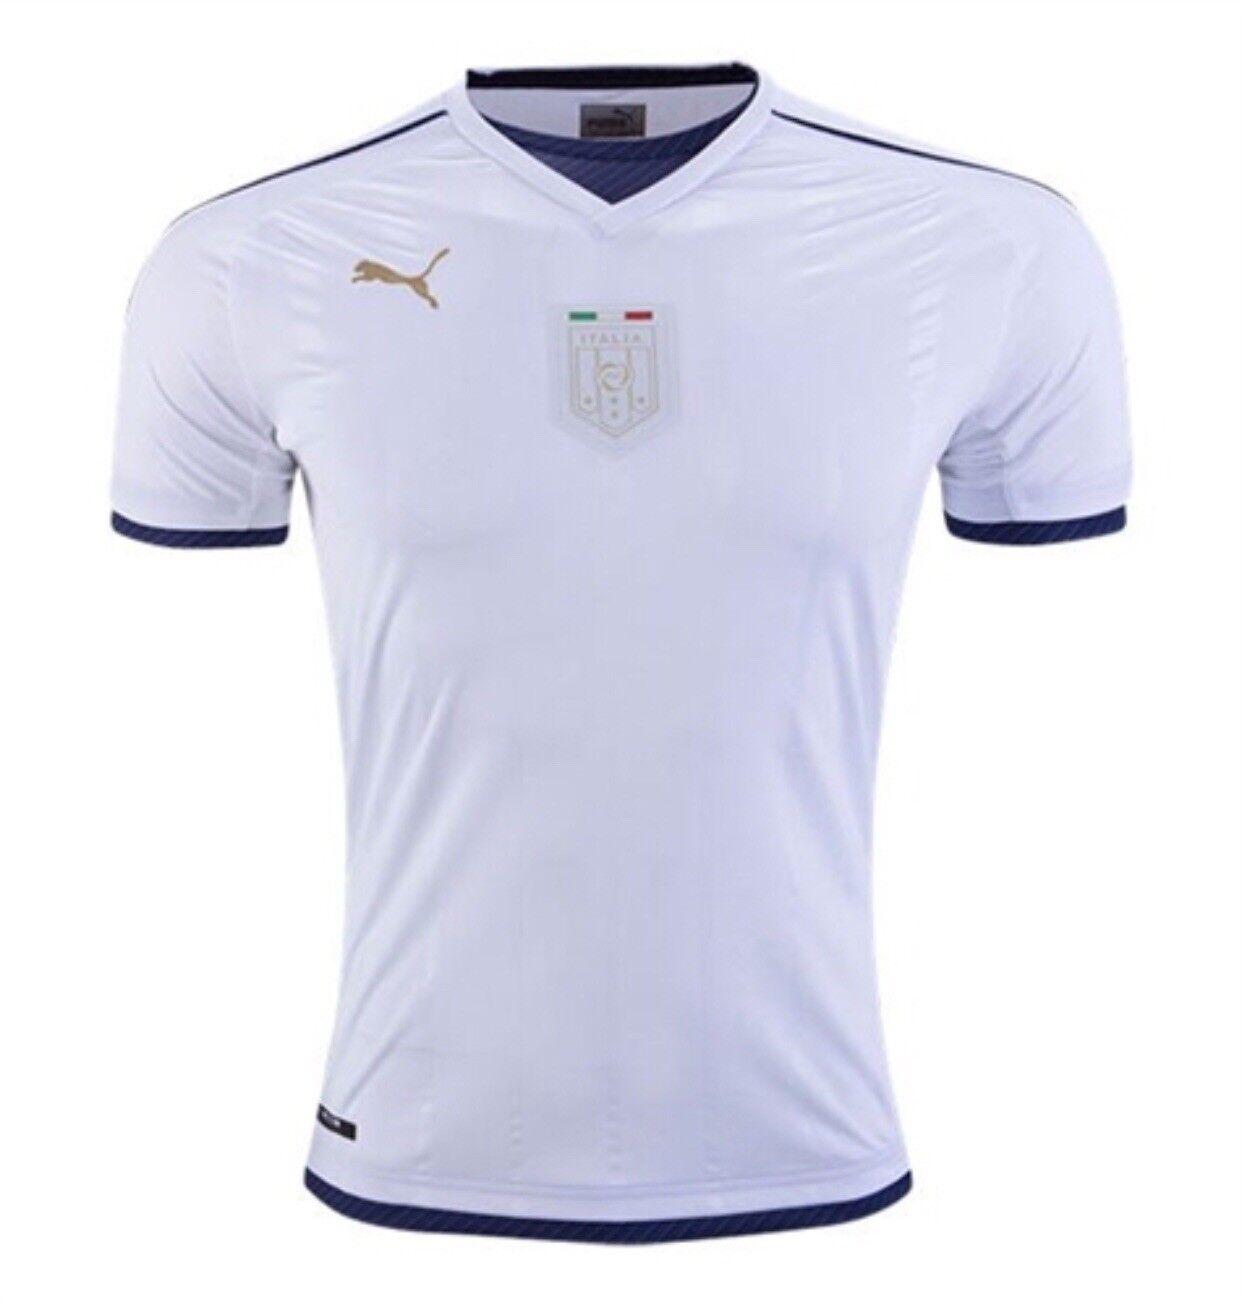 PUMA Herren FIGC TRIBUTE AWAY ITALIA Weiß PEACOAT JERSEY DRY CELL ITALIAN NWT